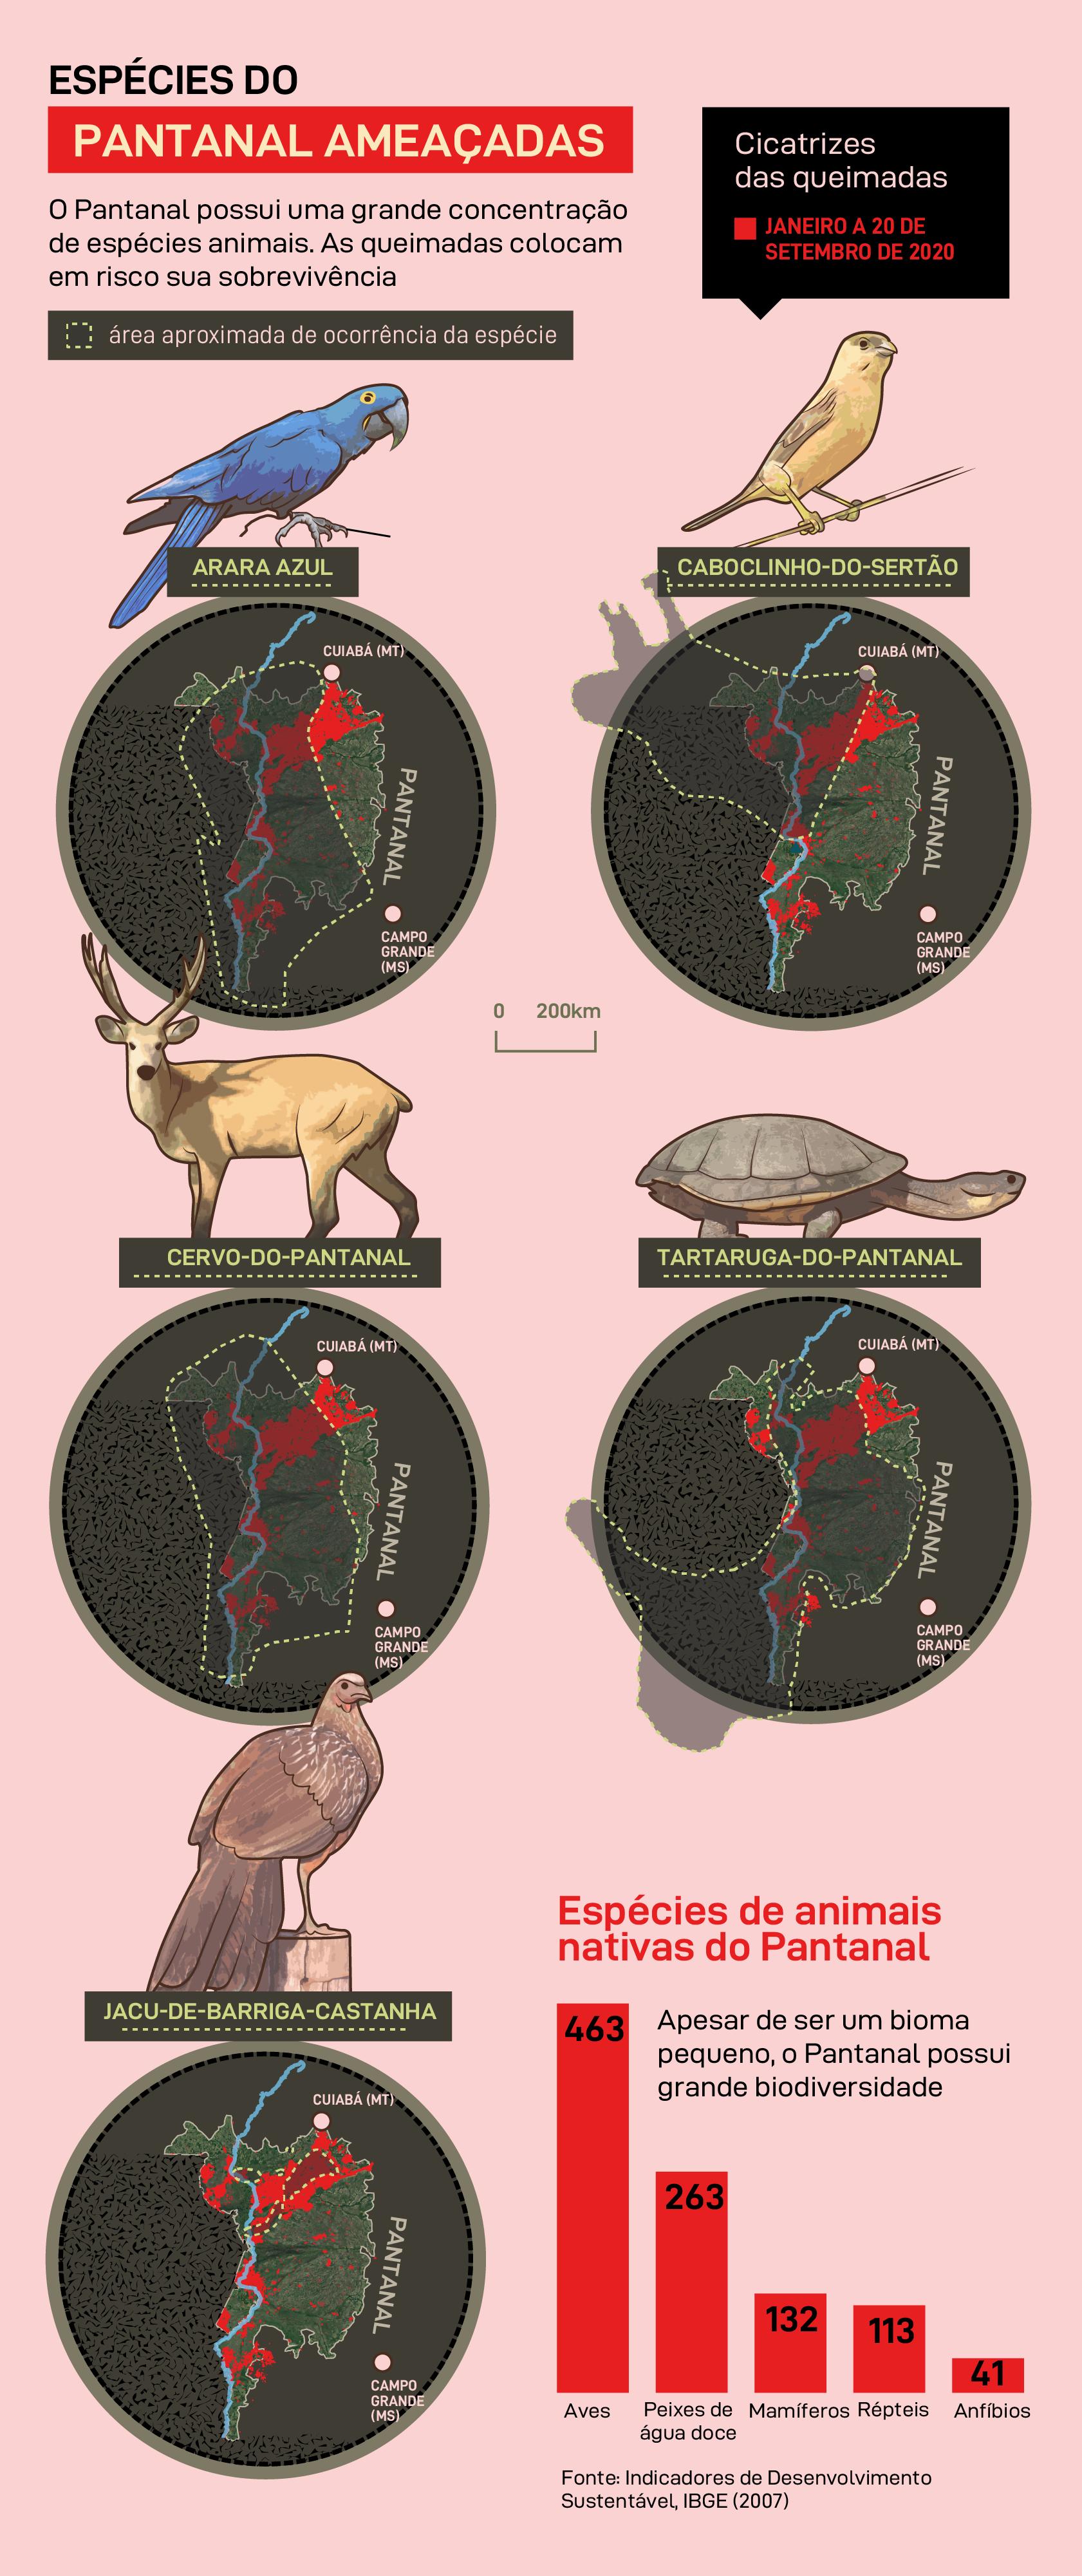 Espécies do Pantanal ameaçadas